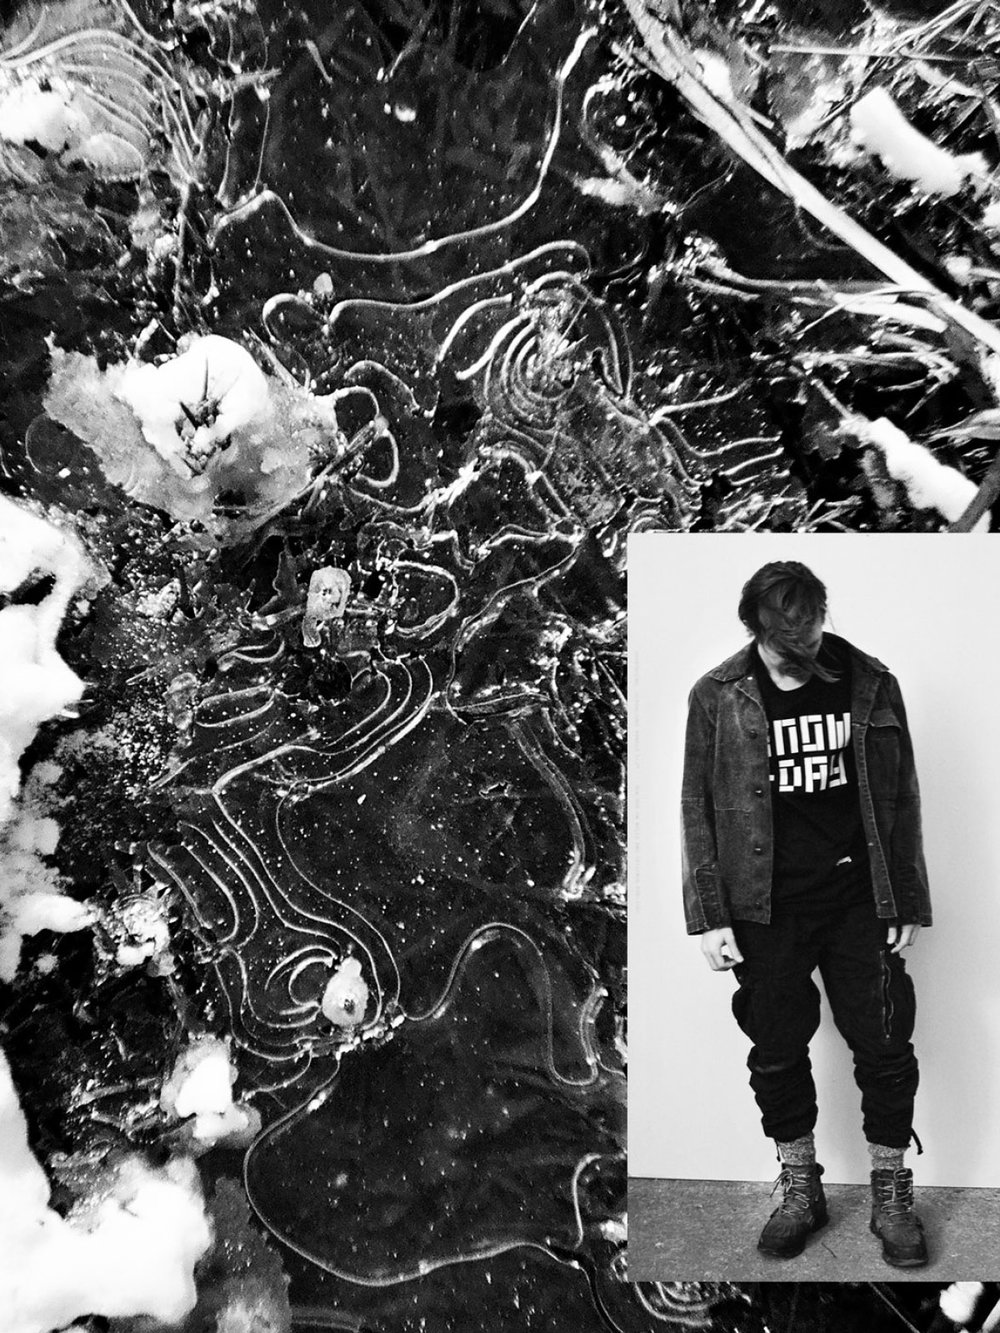 Laniosz-Prairie-Snow-Day-5.jpg